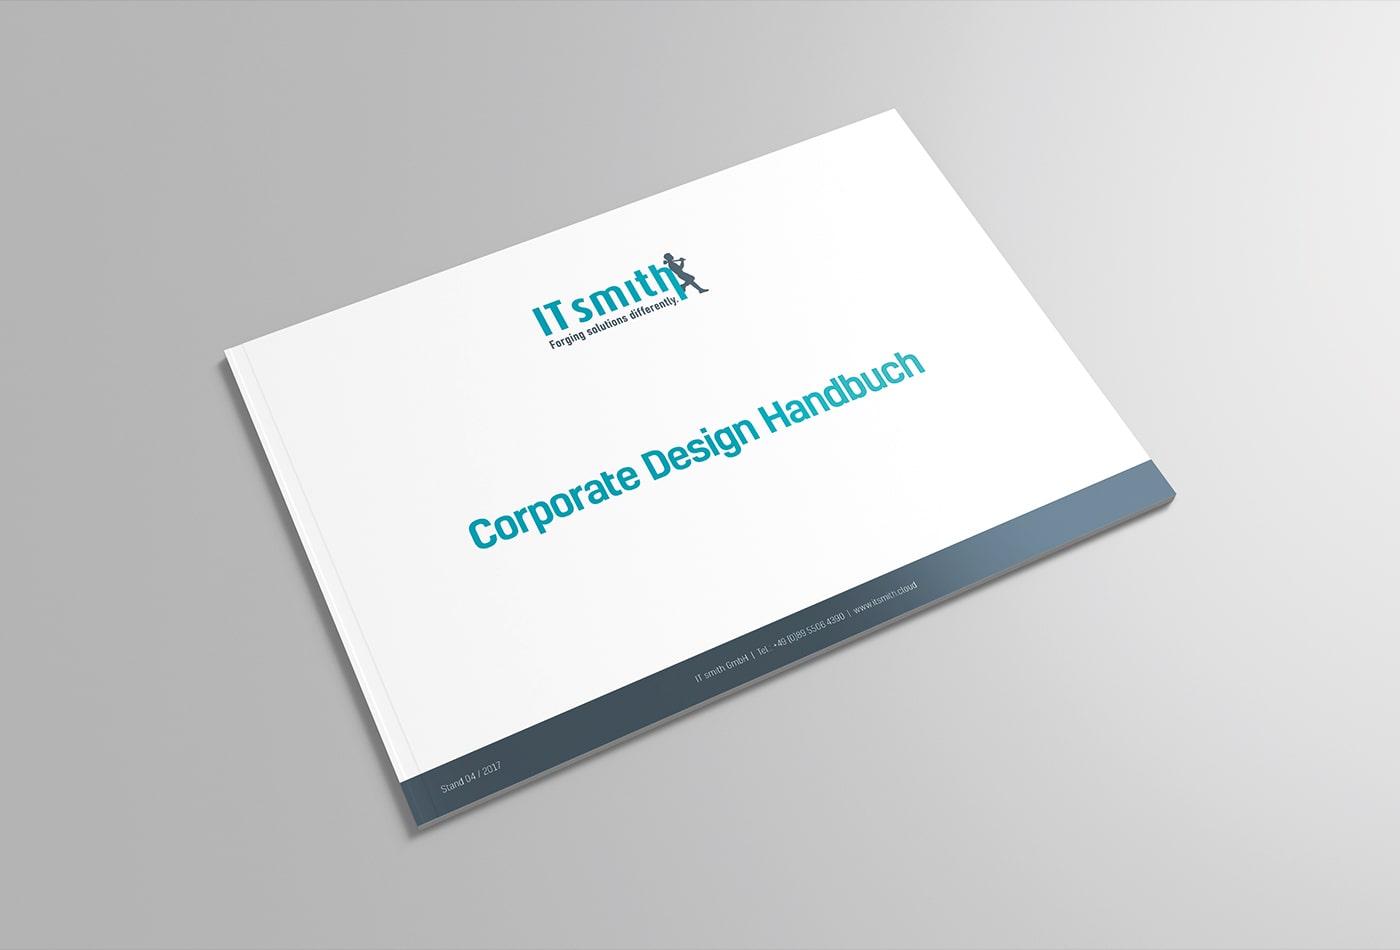 IT Smith Corporate Design